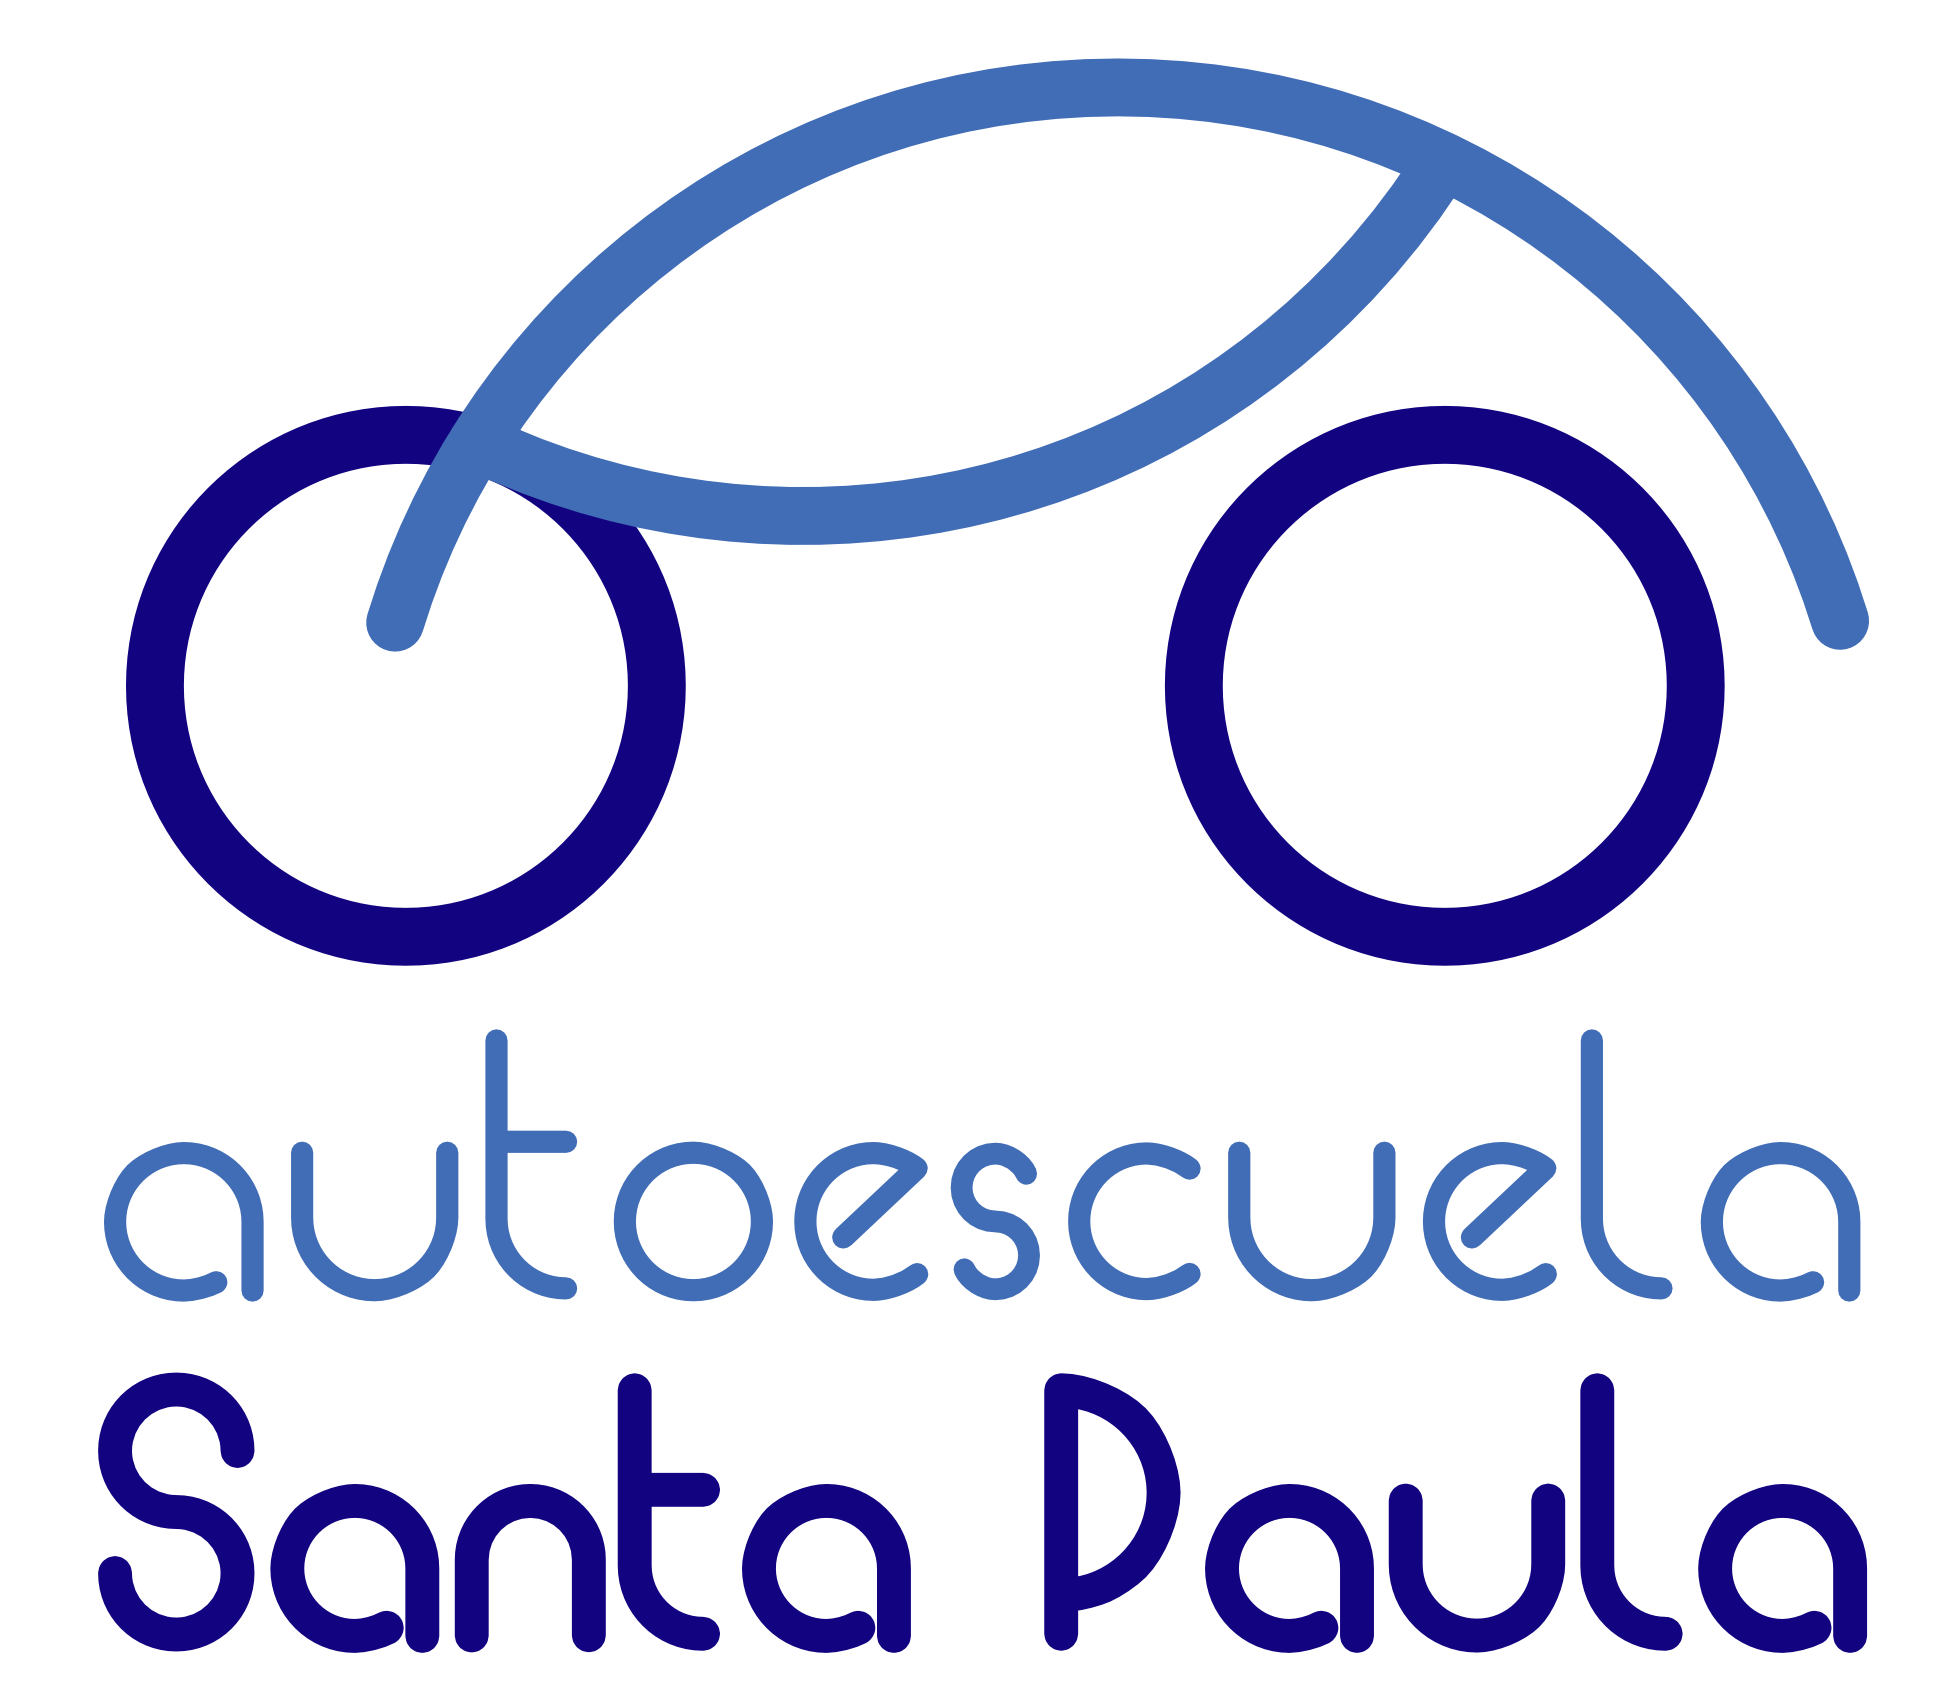 Autoescuela Santa Paula